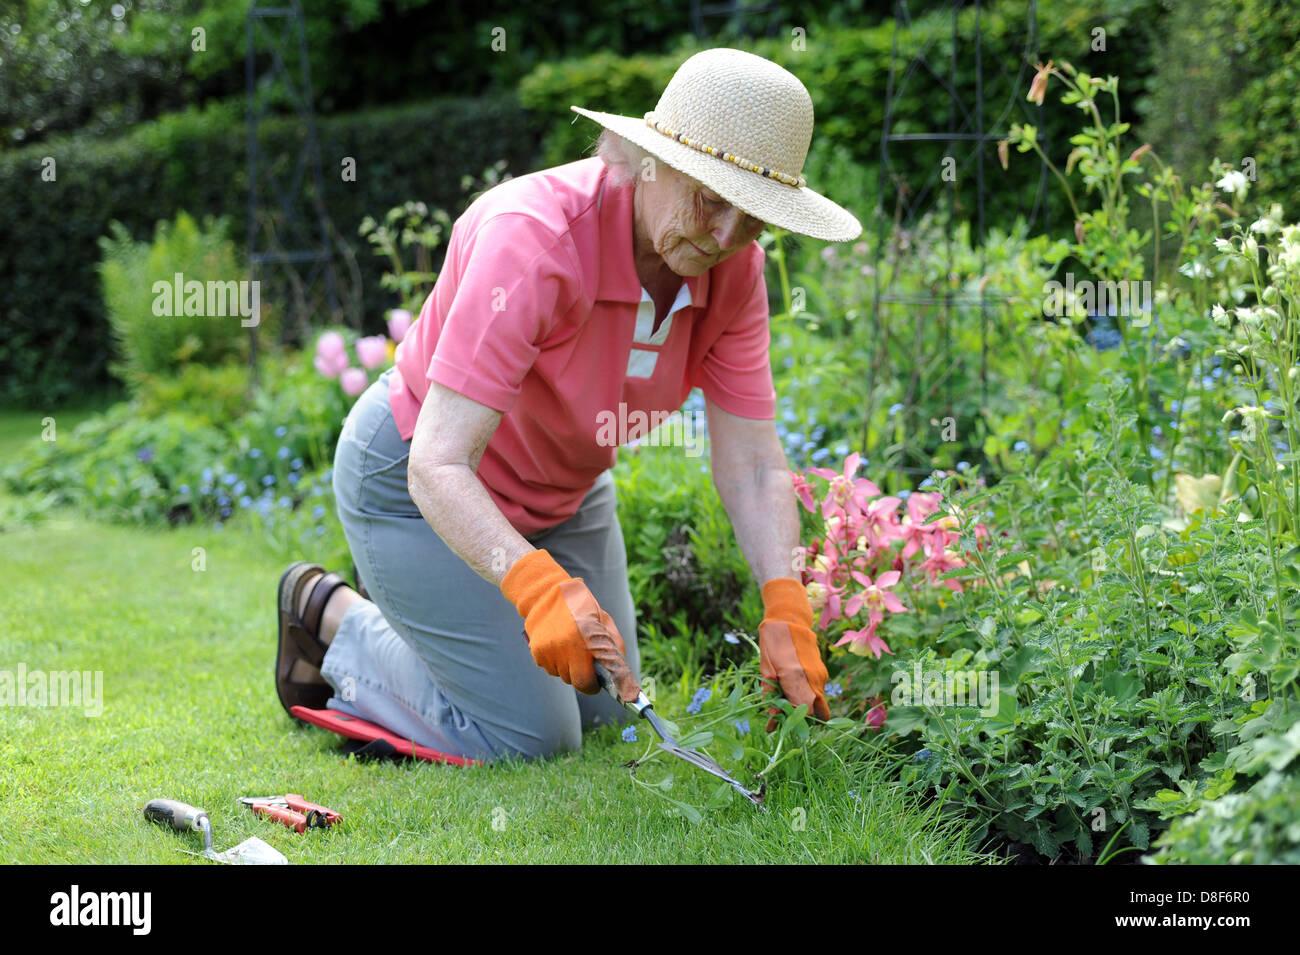 Elderly Lady Gardening In Her Family Garden At Home In